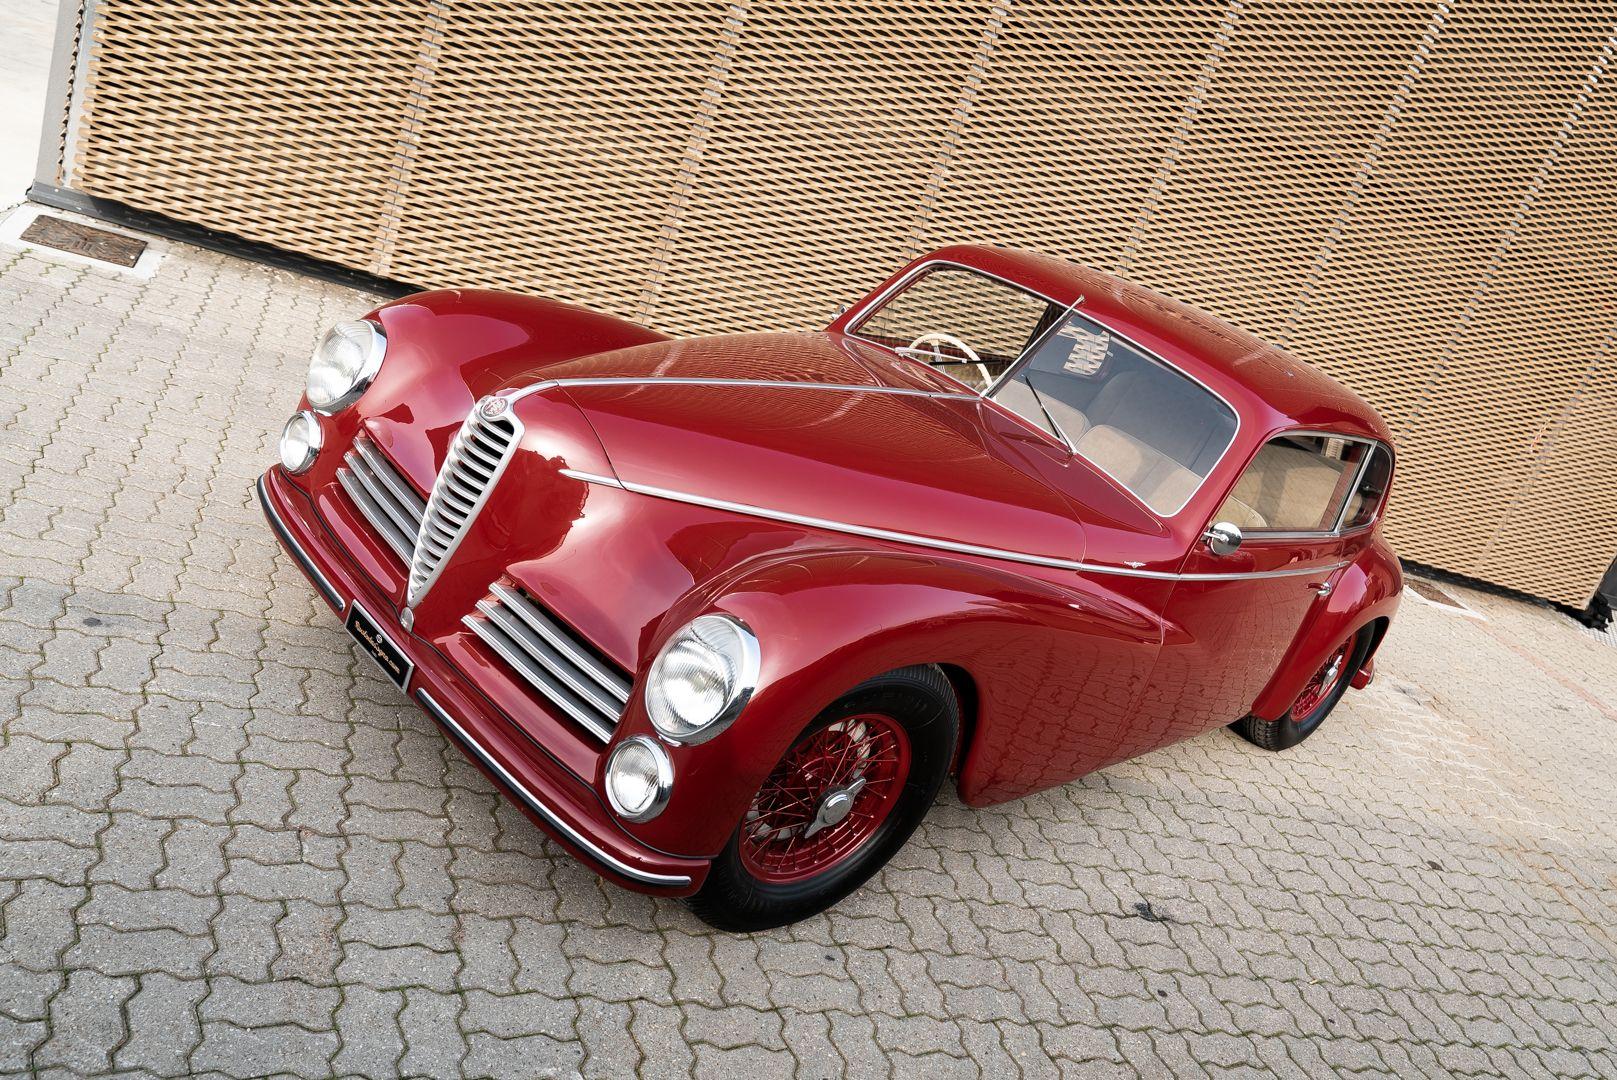 1947 Alfa Romeo Freccia d'oro 6C 2500 Sport 61712